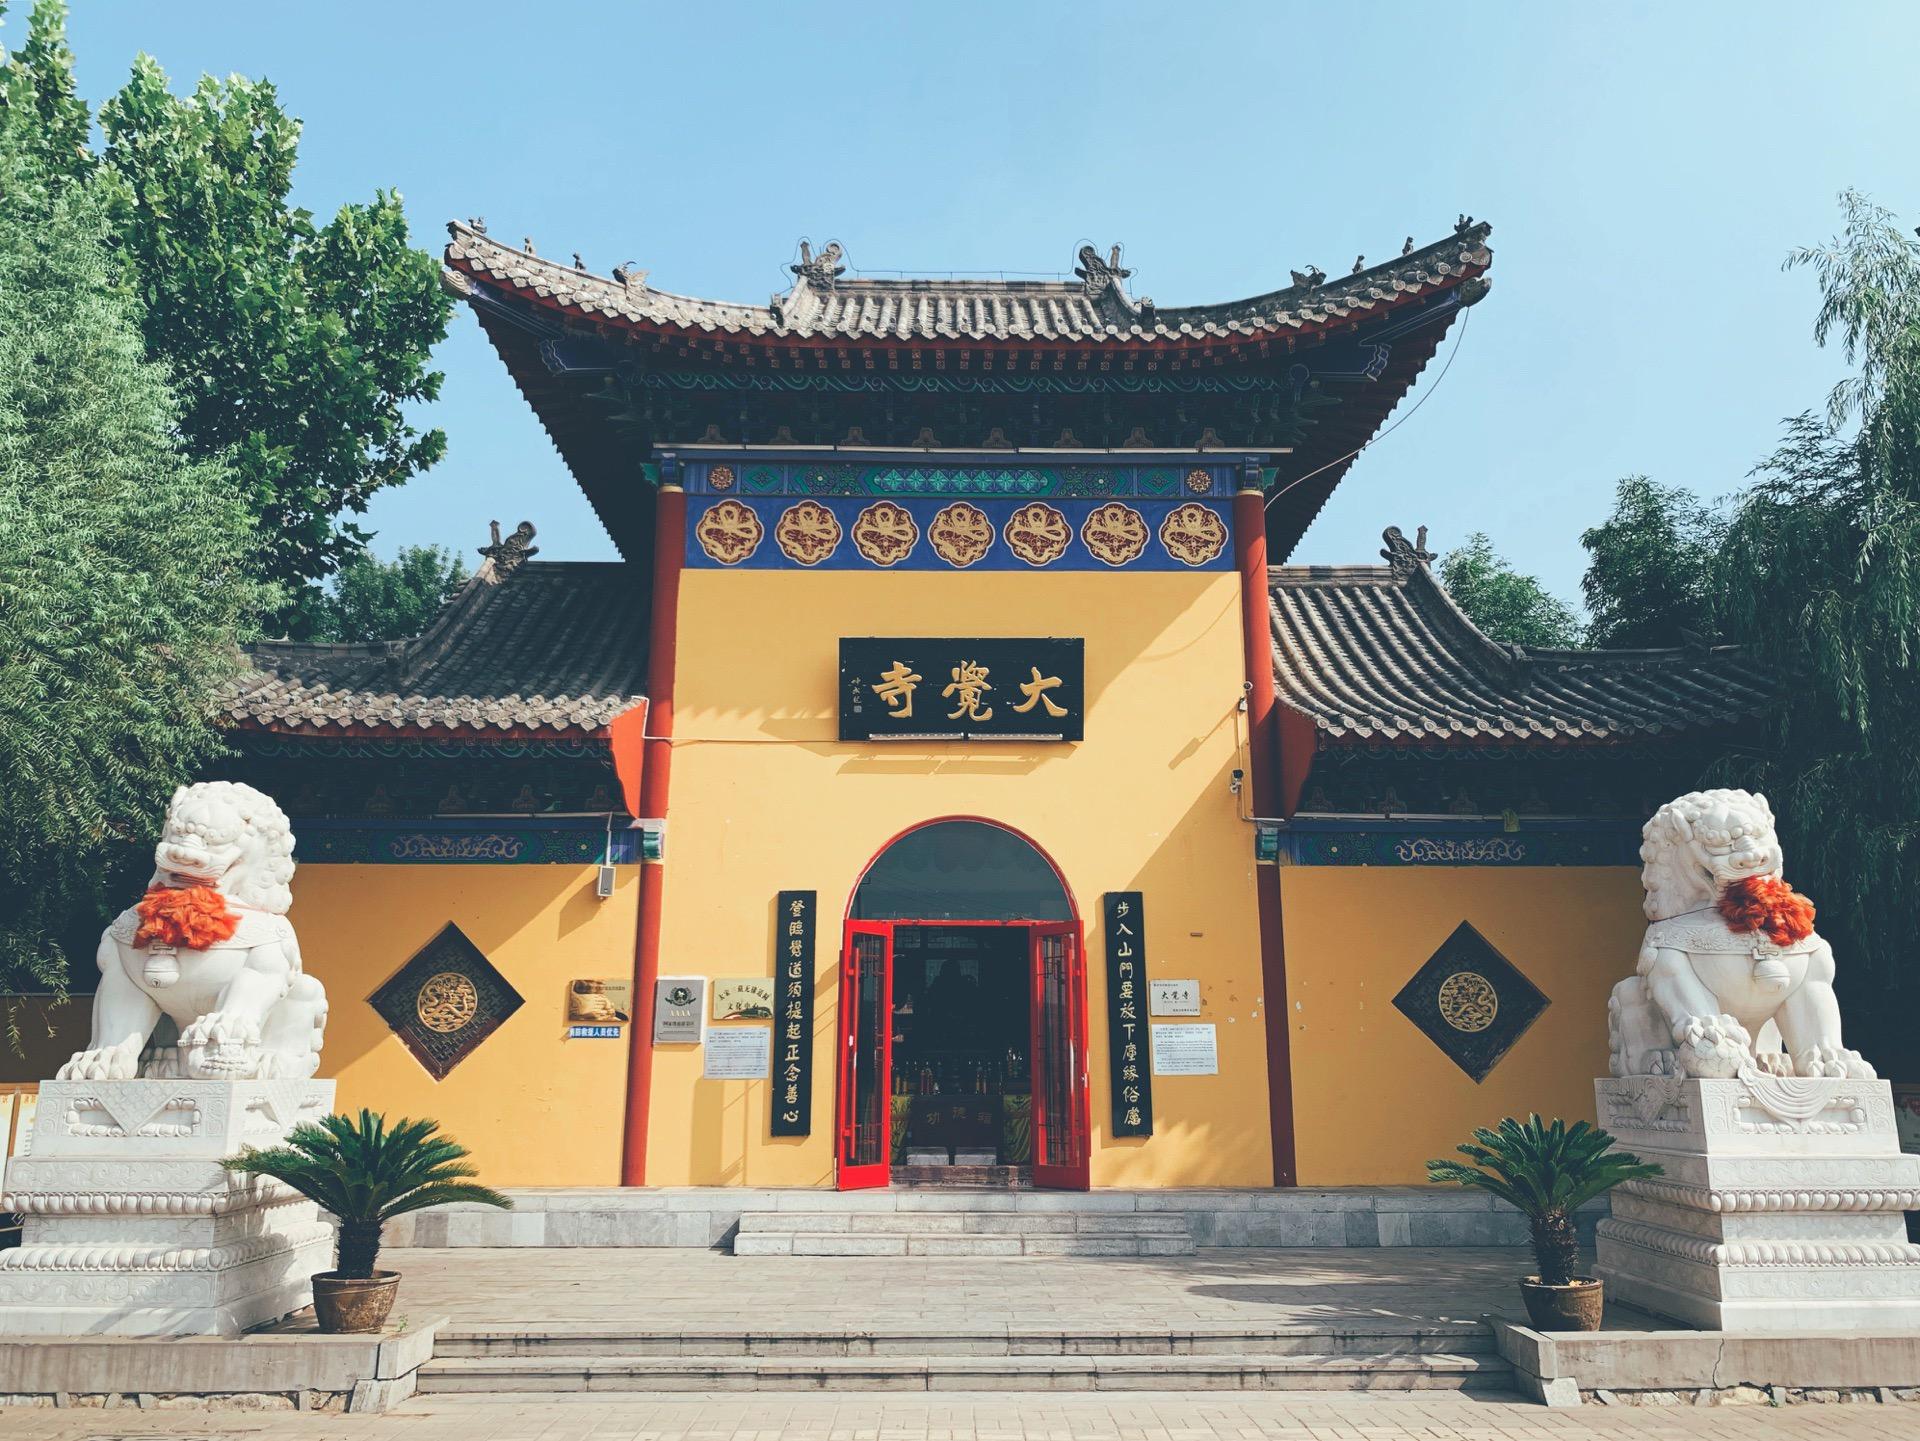 Wudigucheng Tourism Sceneic Area